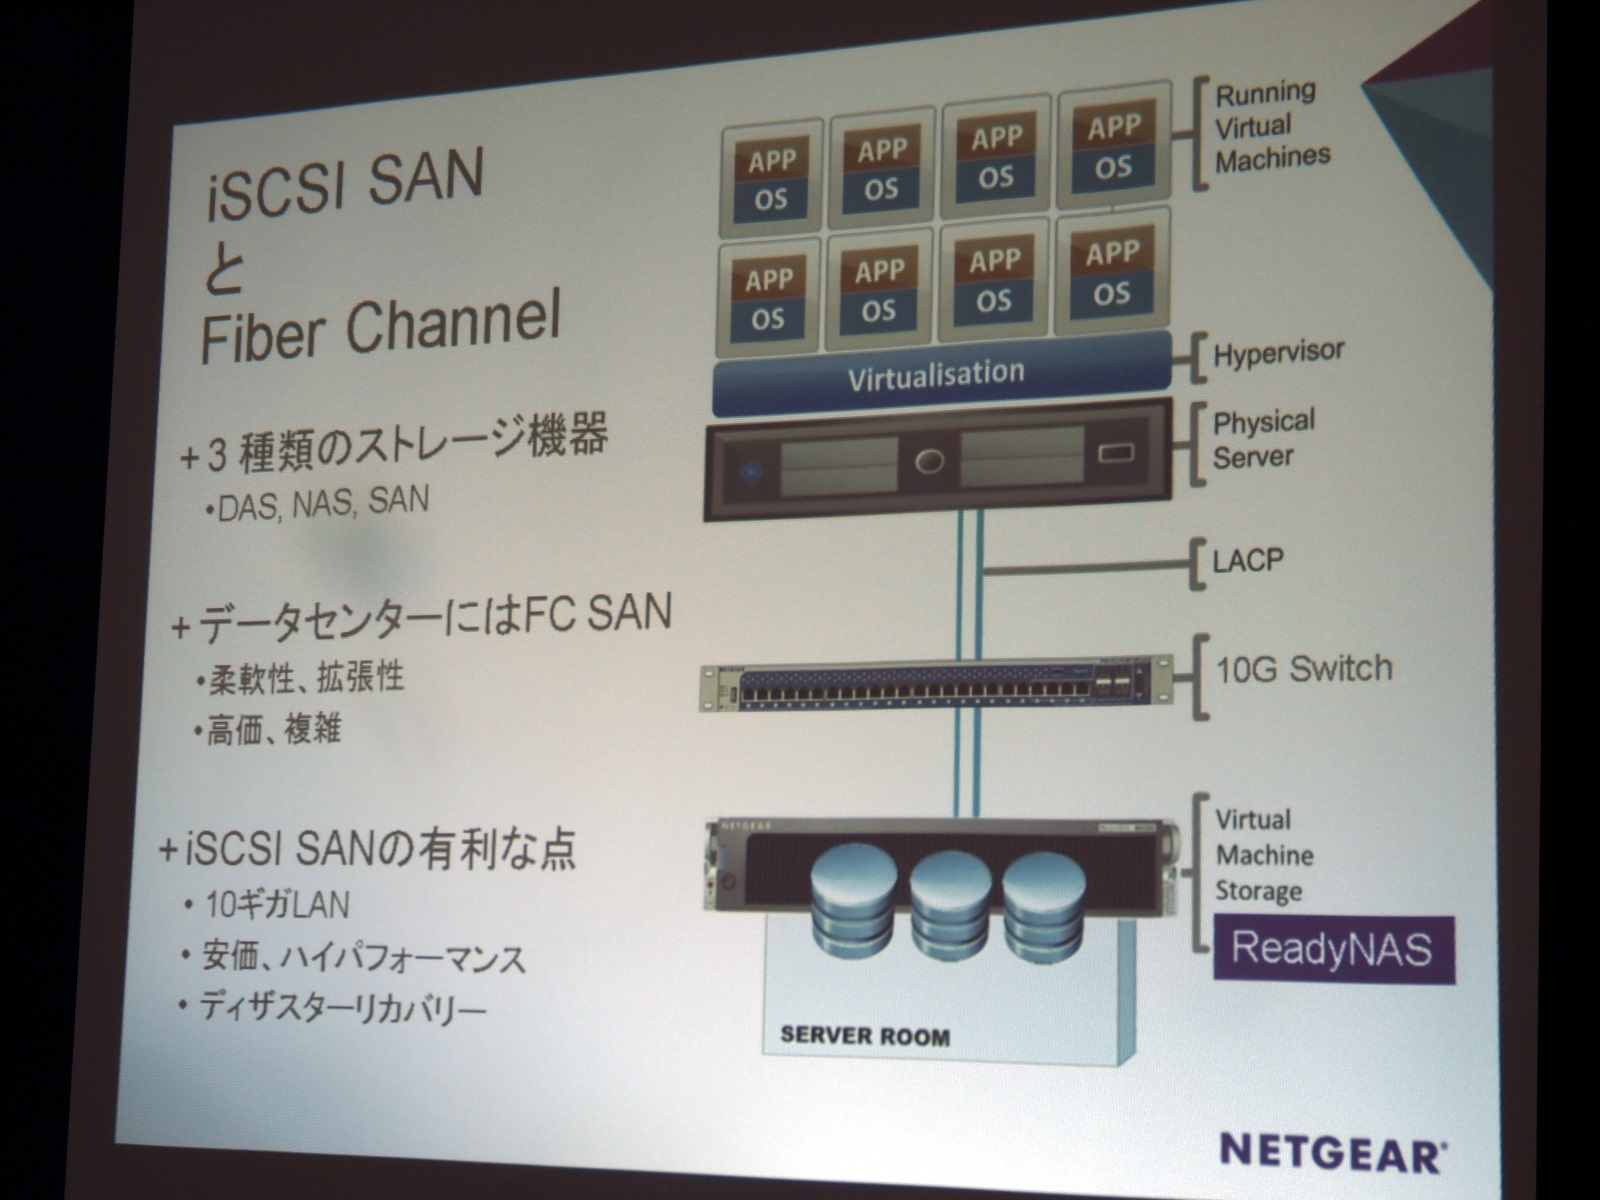 iSCSI SANとFiber Channel